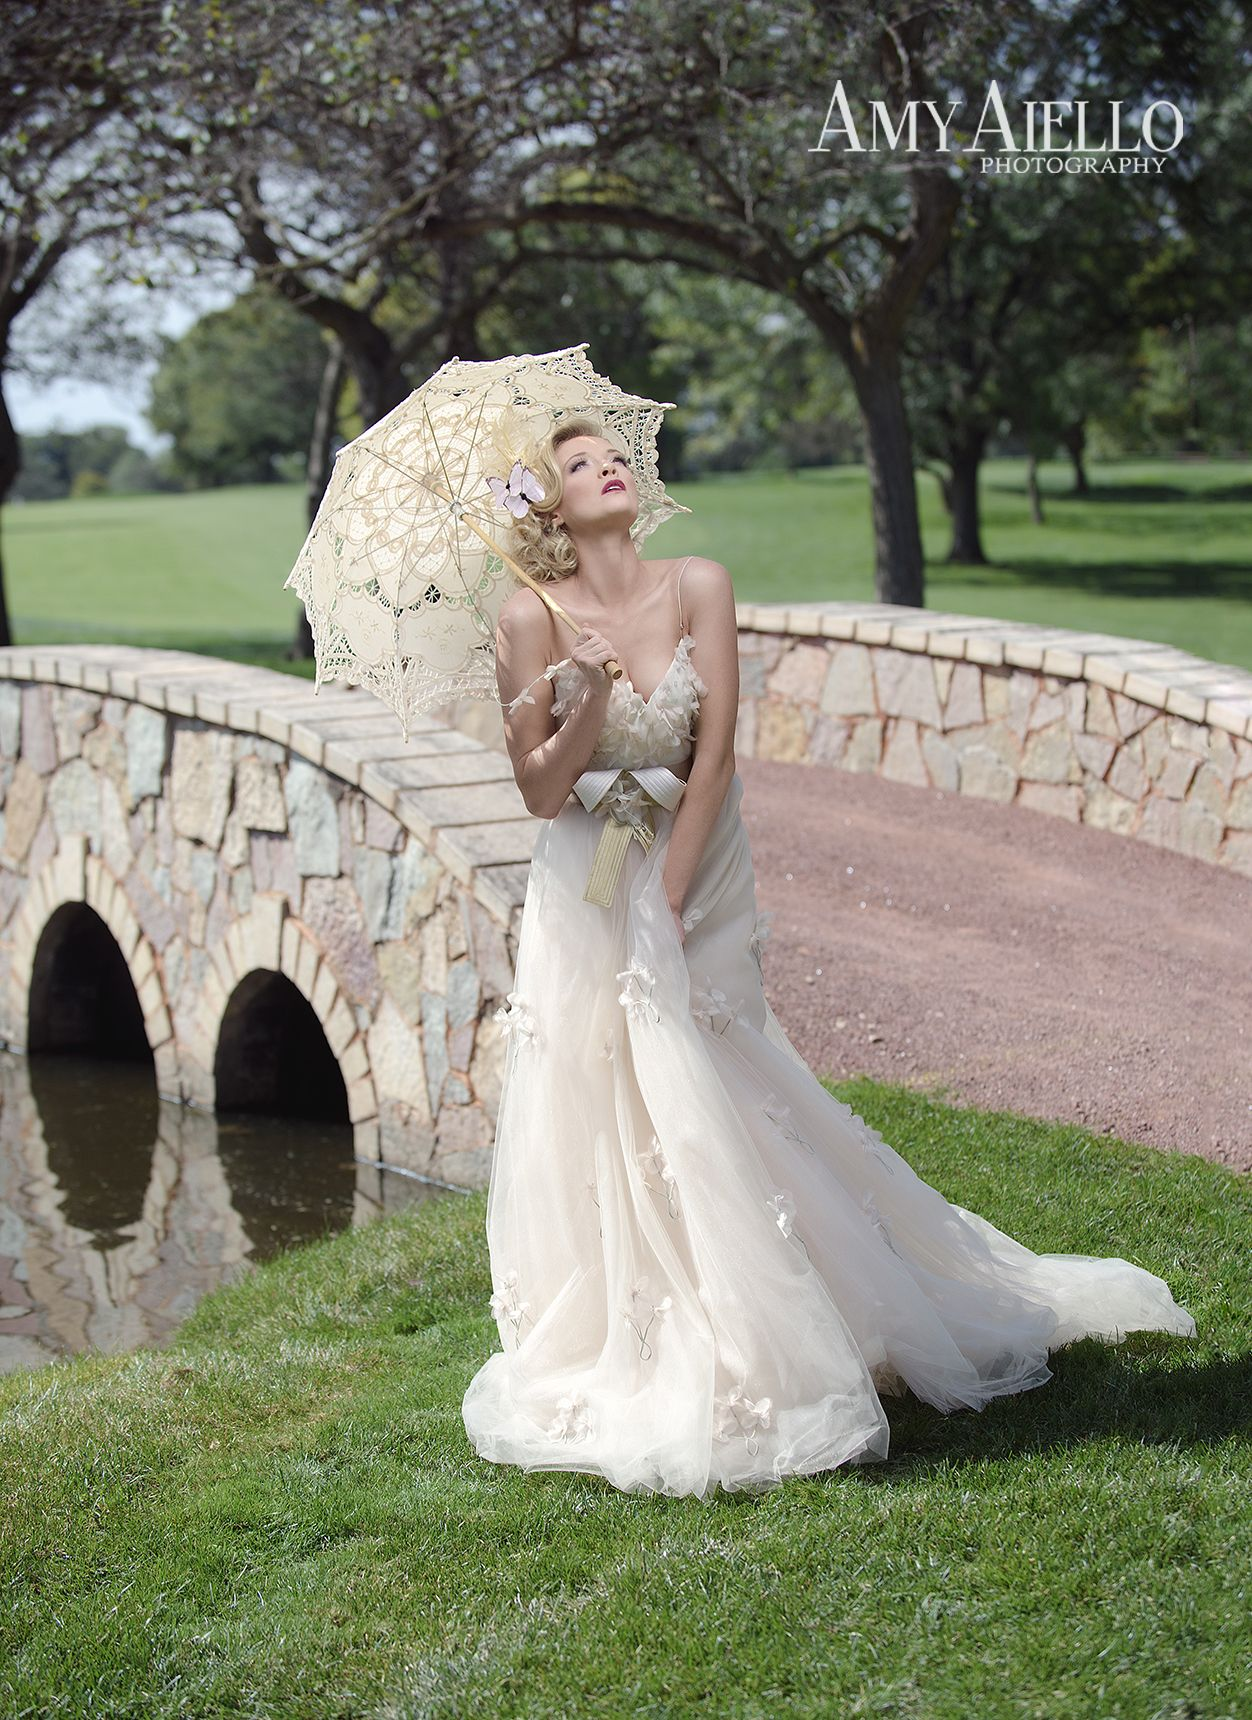 Country girl wedding dress  Chicago bridal fashion photographer high end wedding photographer